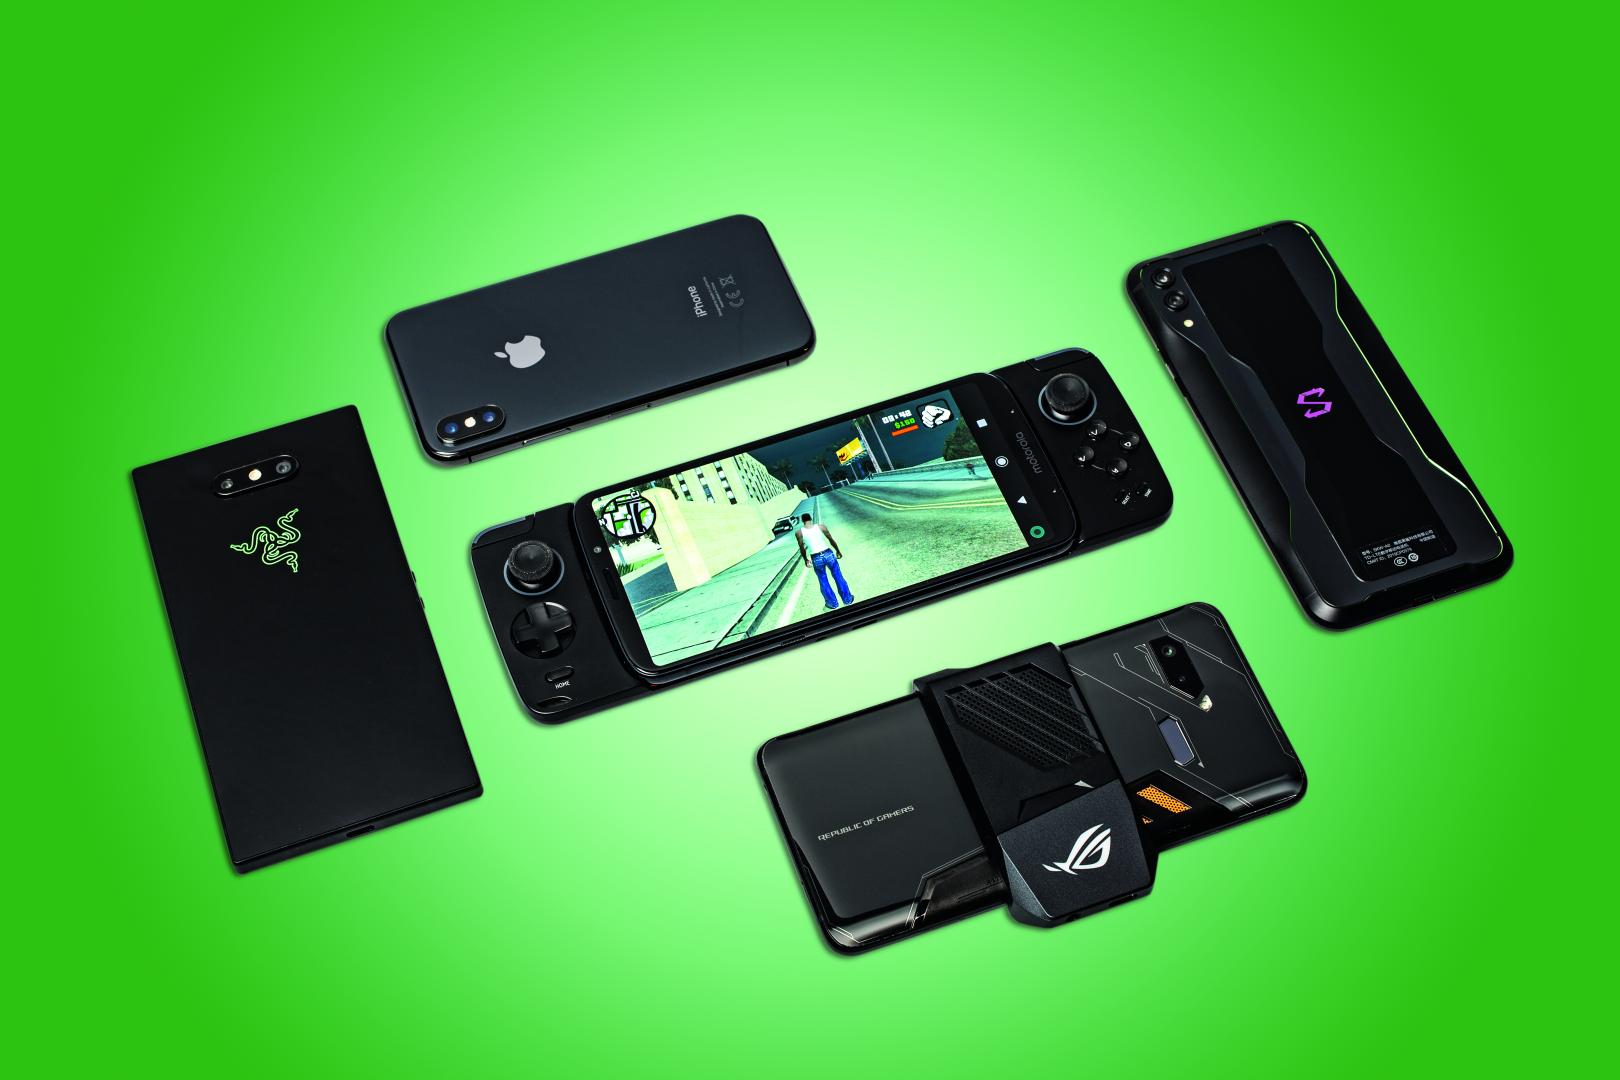 game smartphone test mobiel gamen iPhone Android Rog Phone Razer Phone Black Shark